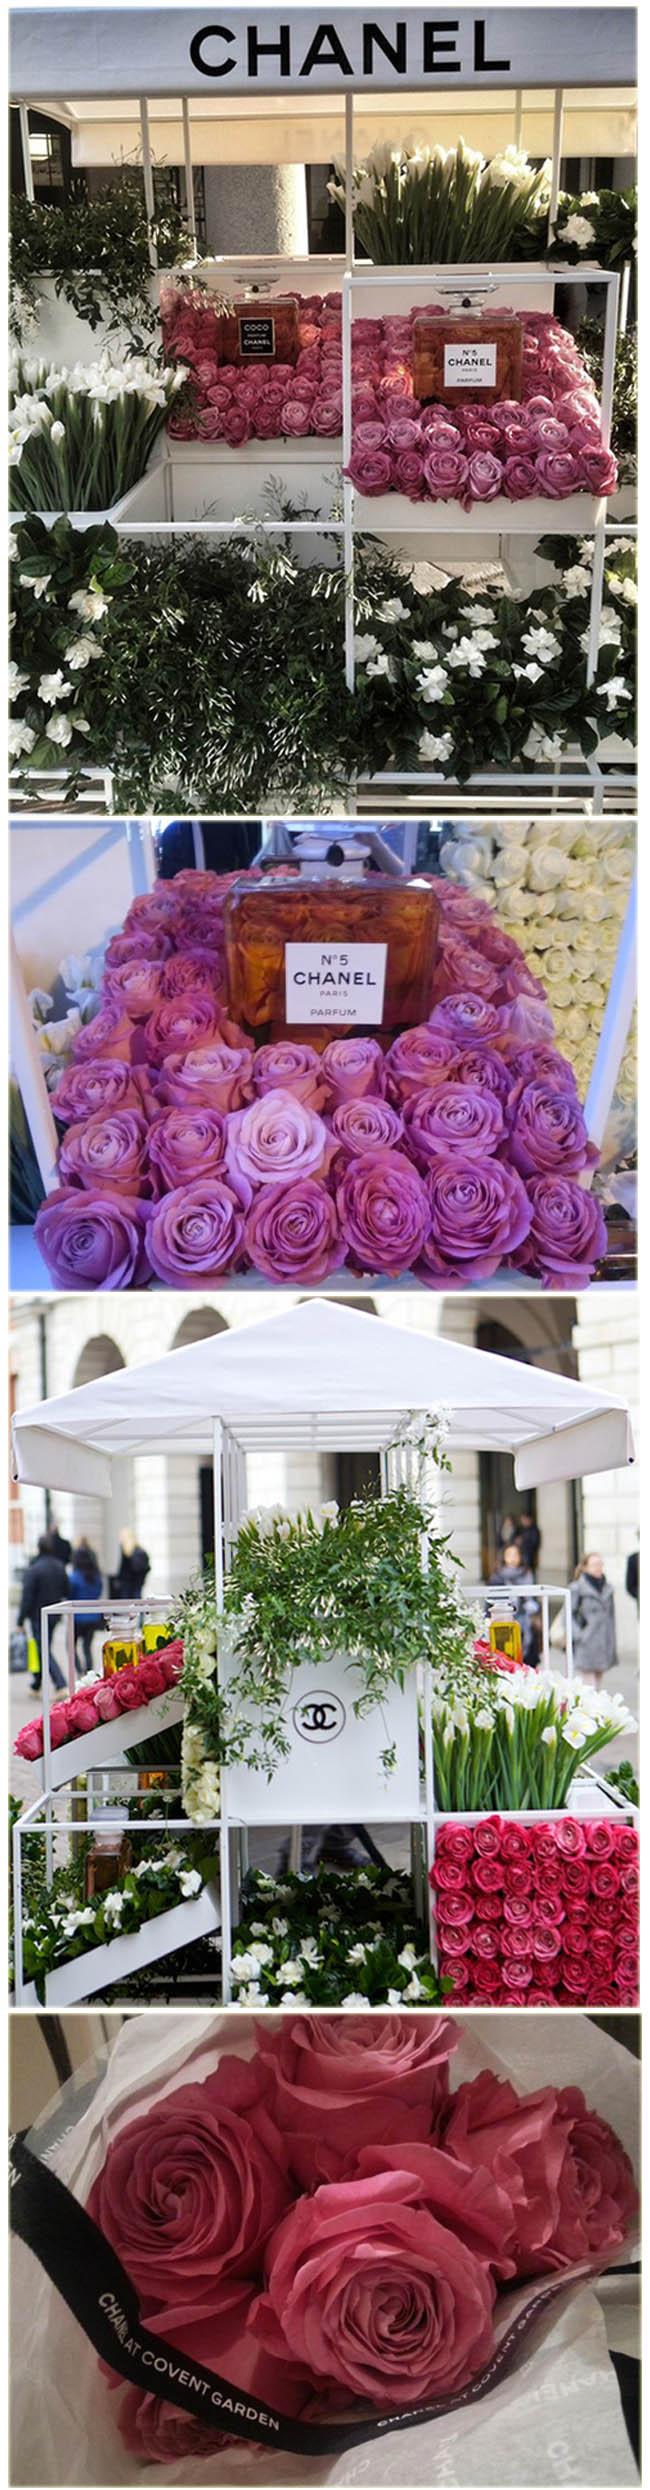 chanel, chanel dia das maes, pop up store chanel flowers, chanel perfumes, londres, dicas de londres